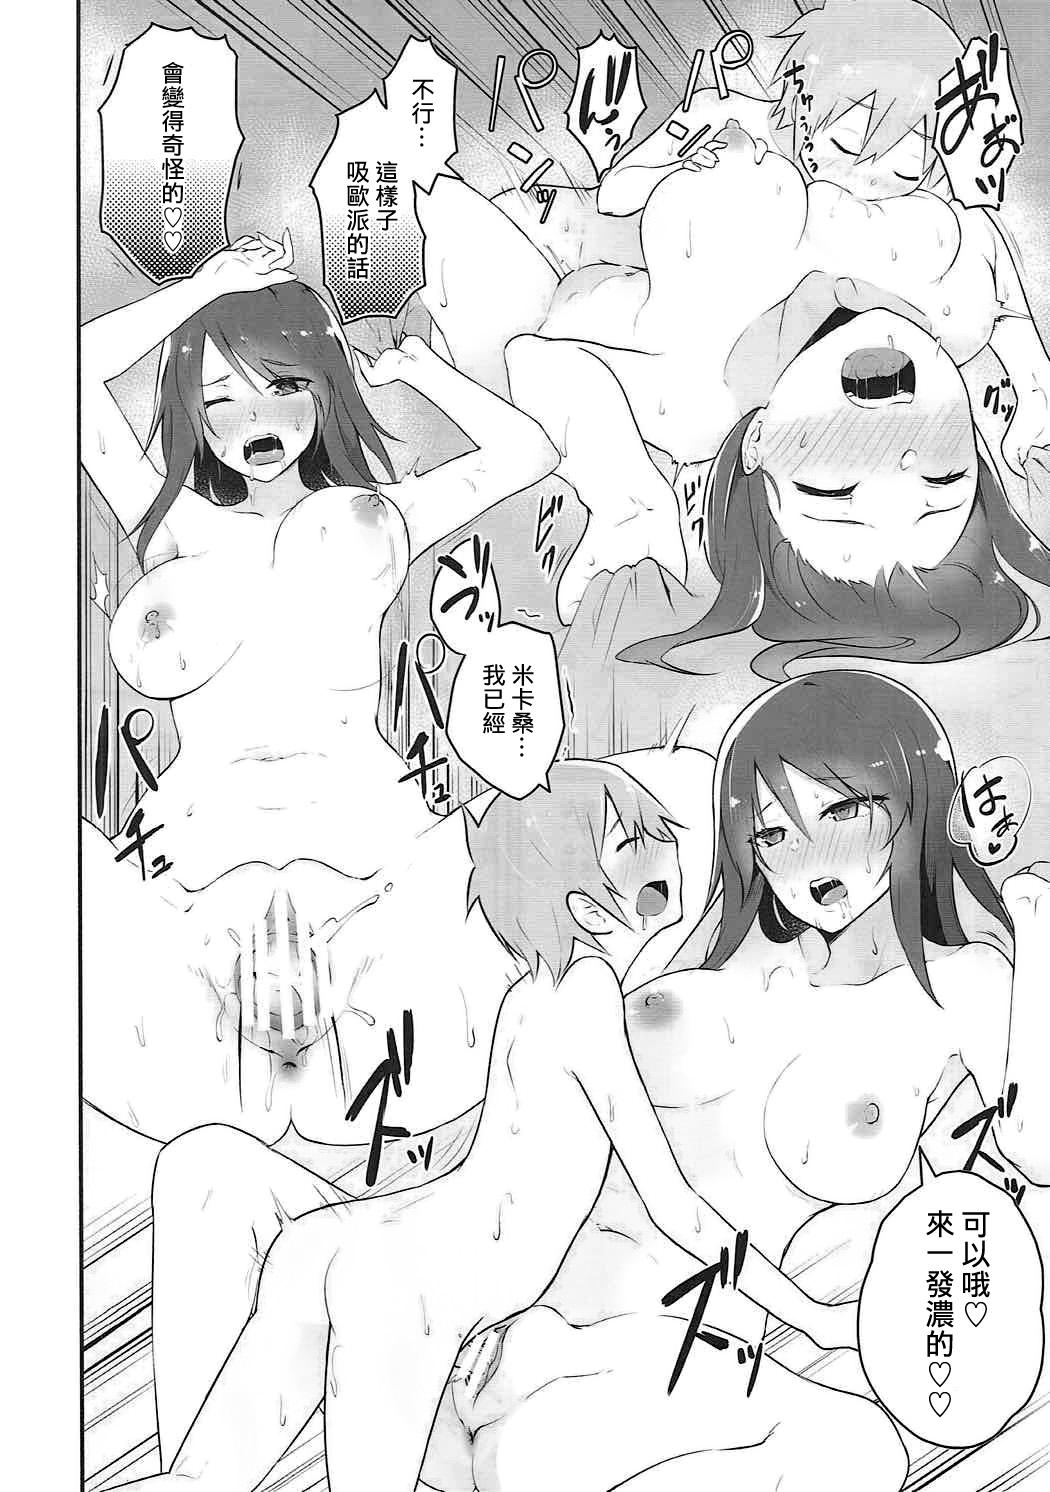 Mika-san to Ichaicha Mujintou Sakusen 17